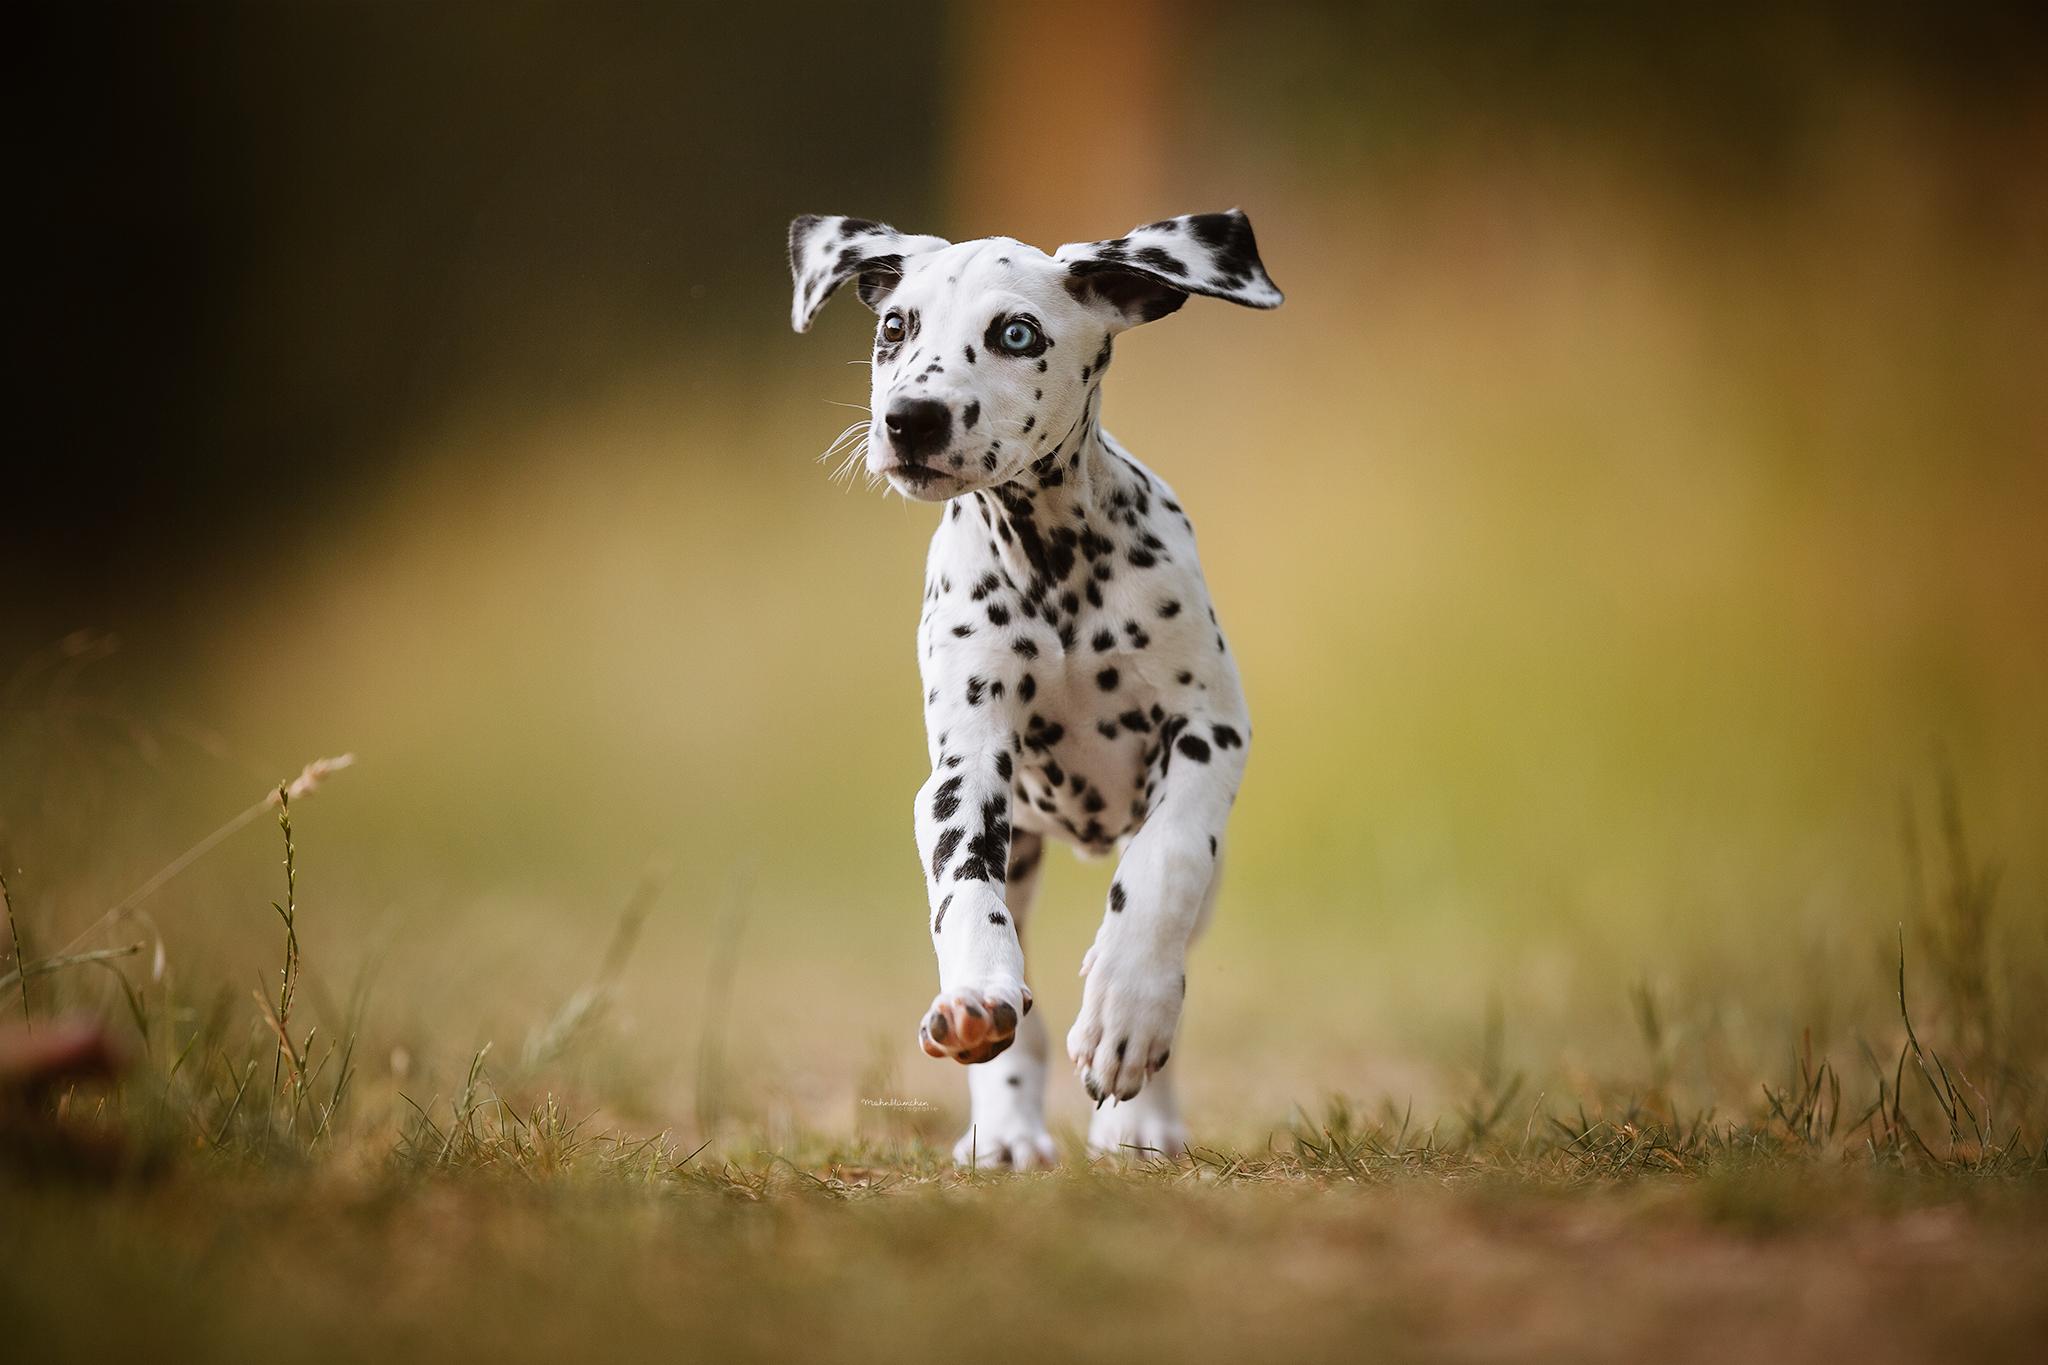 Dalmatiner Welpe In 2020 Dalmatiner Welpen Hundebilder Tierfotografie